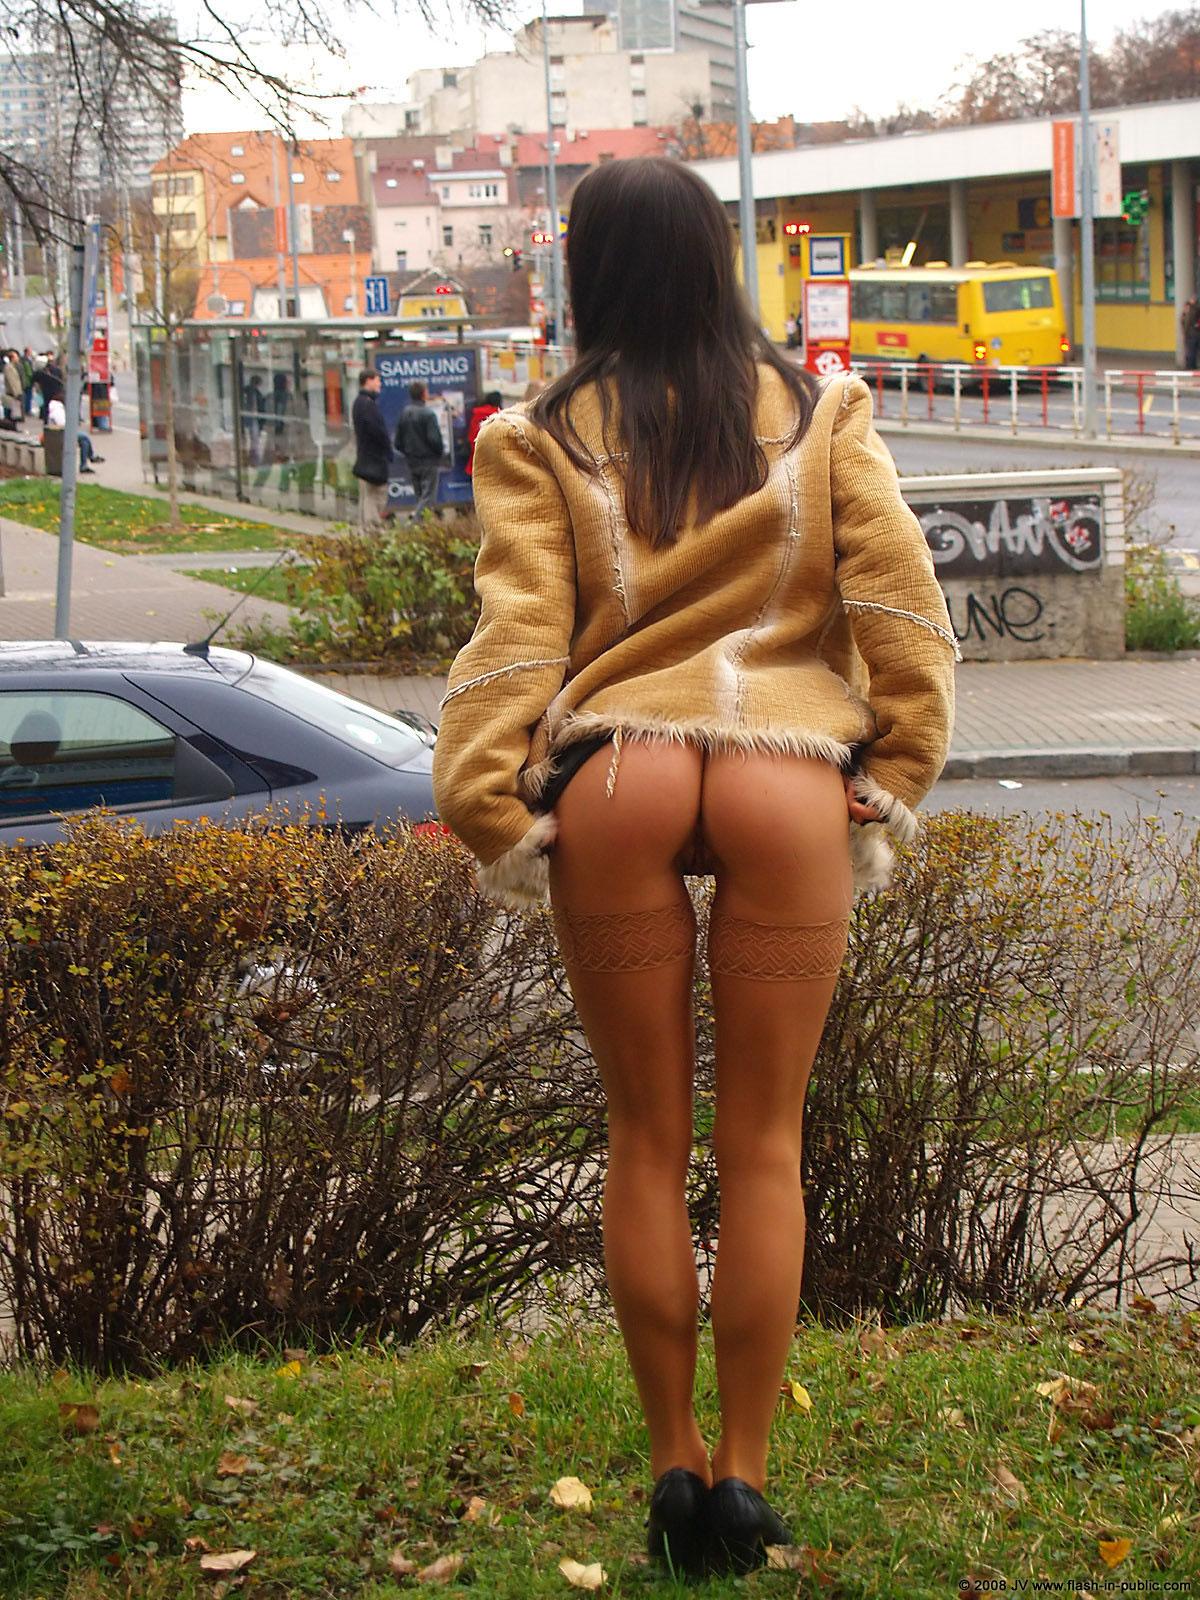 alexandra-g-bottomless-stockings-flash-in-public-26